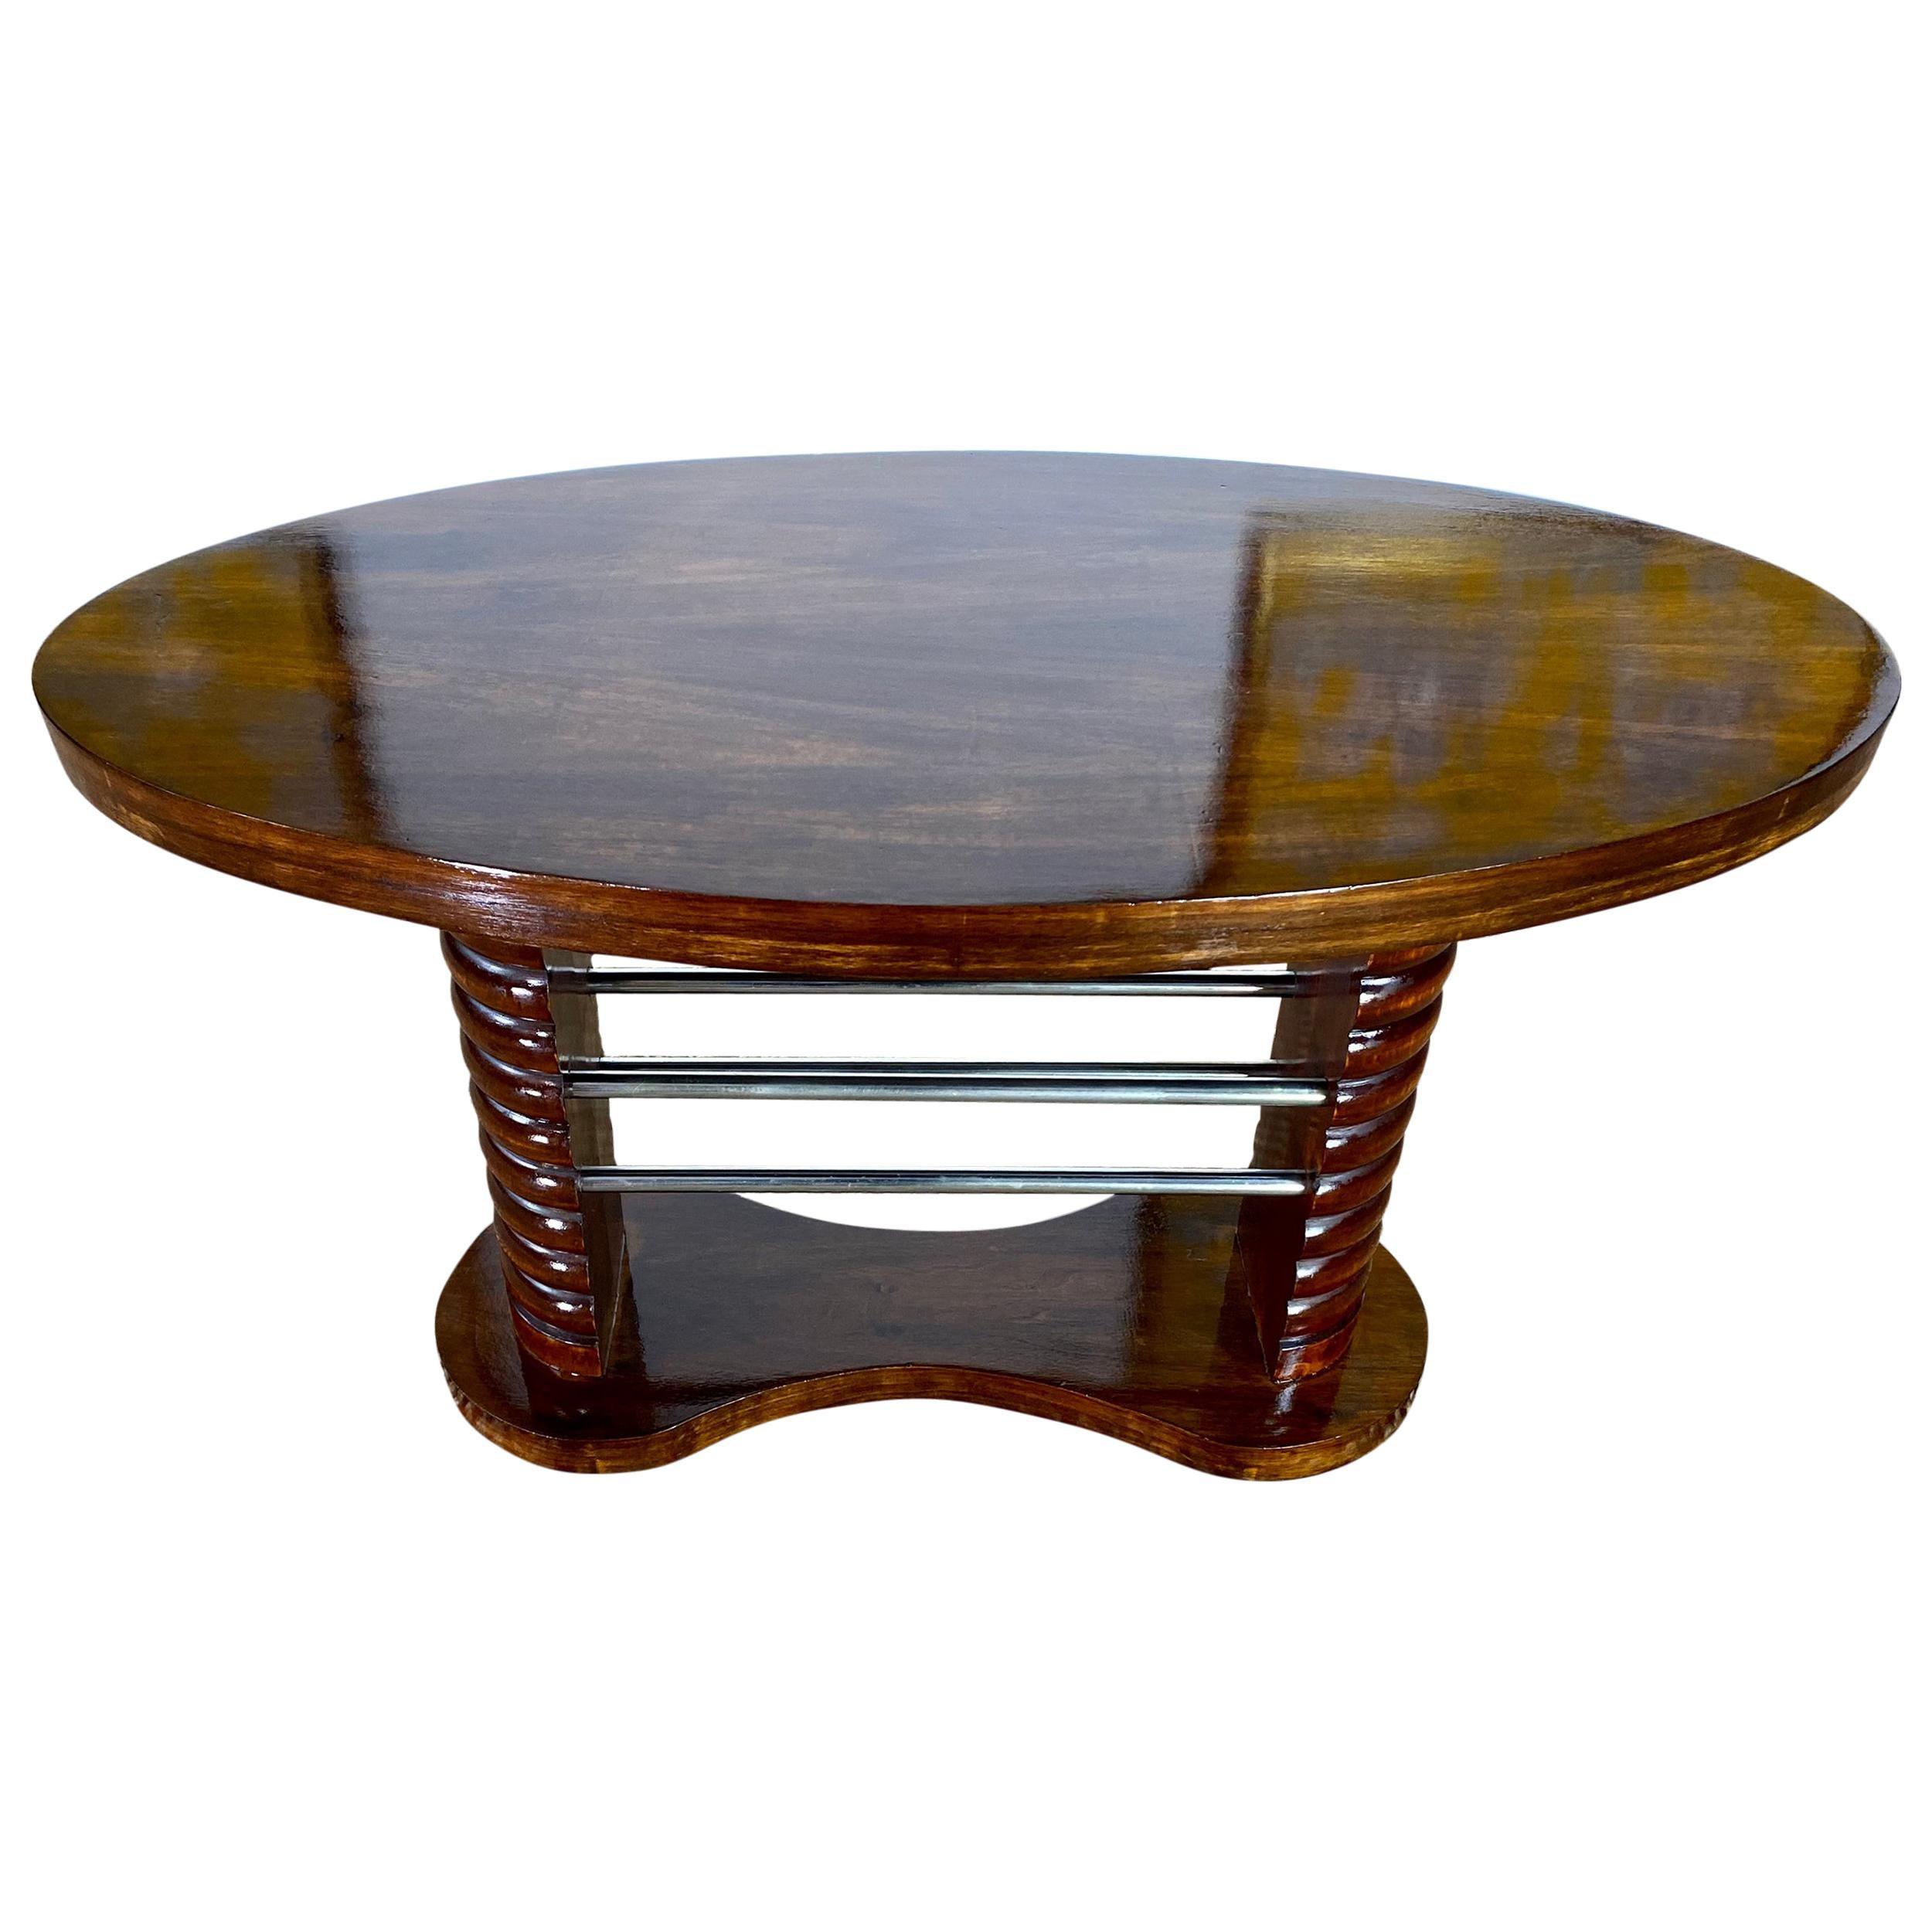 Art Deco French Coffee Side Table, Mahogany, Chrome Guéridon, France, circa 1930